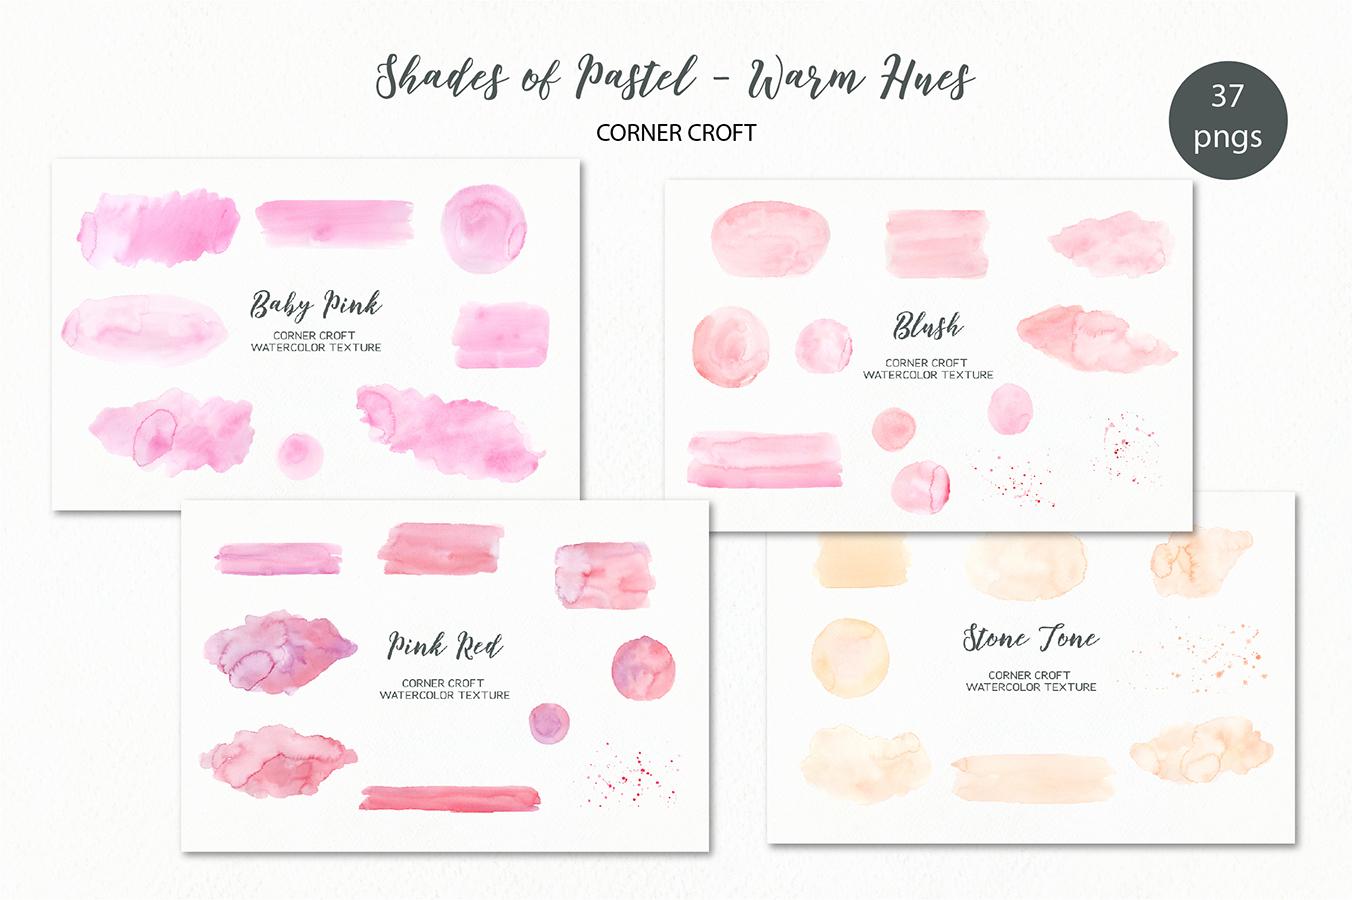 Watercolor texture shades of pastel warm hues example image 1